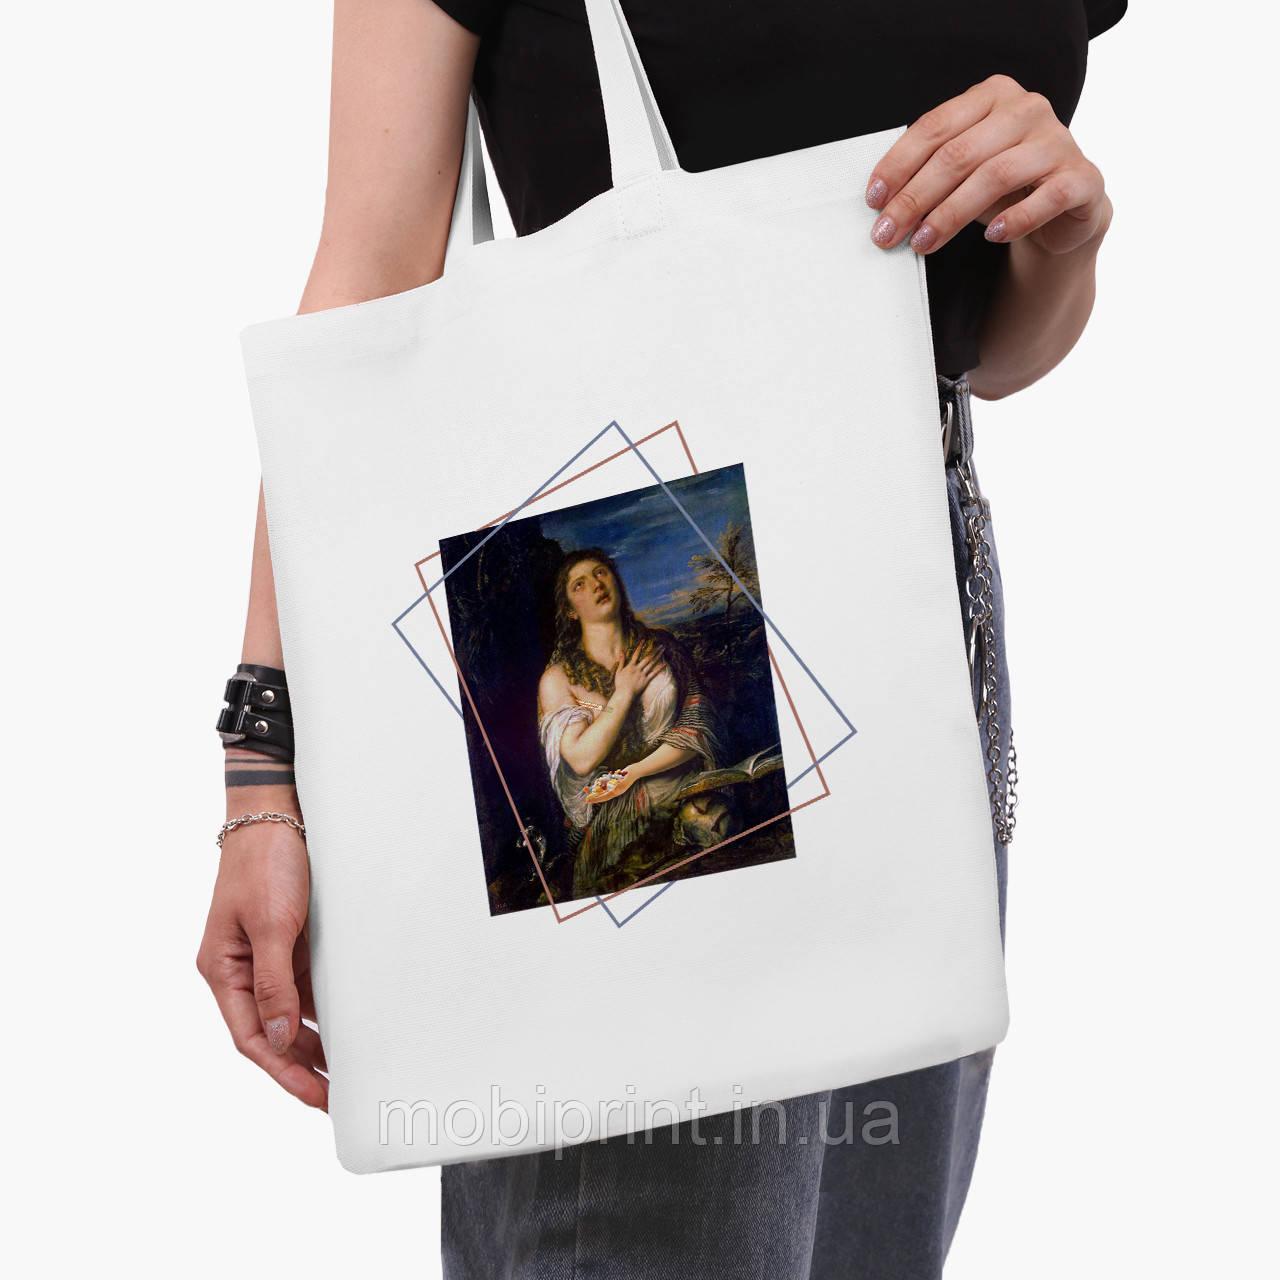 Эко сумка шоппер белая Мария Магдалина (Mary Magdalene) (9227-1413-3)  41*35 см